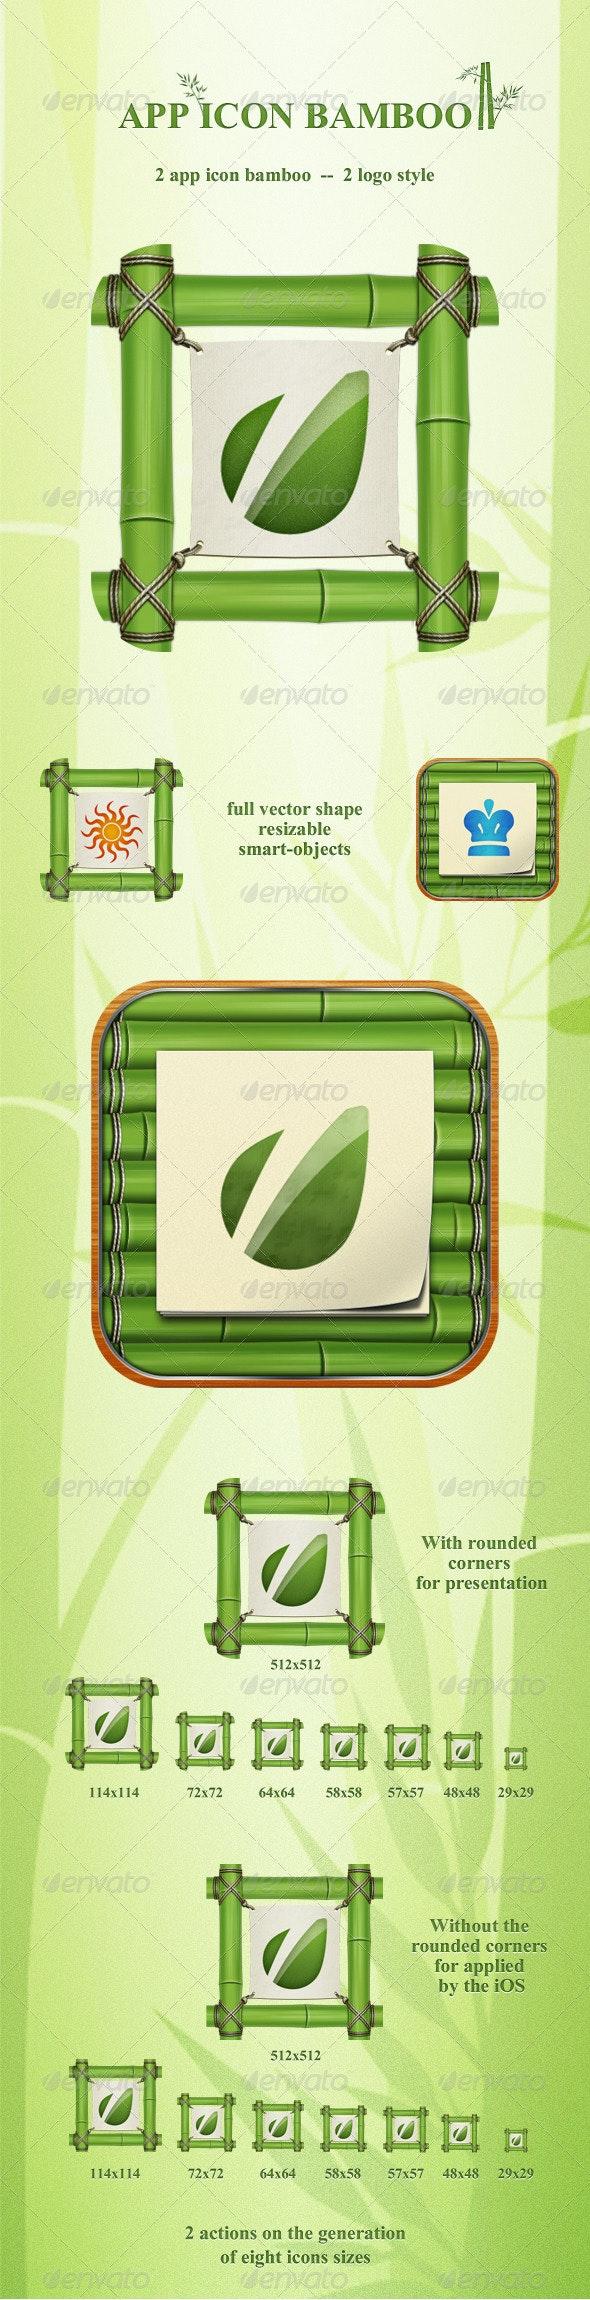 App Icon Bamboo